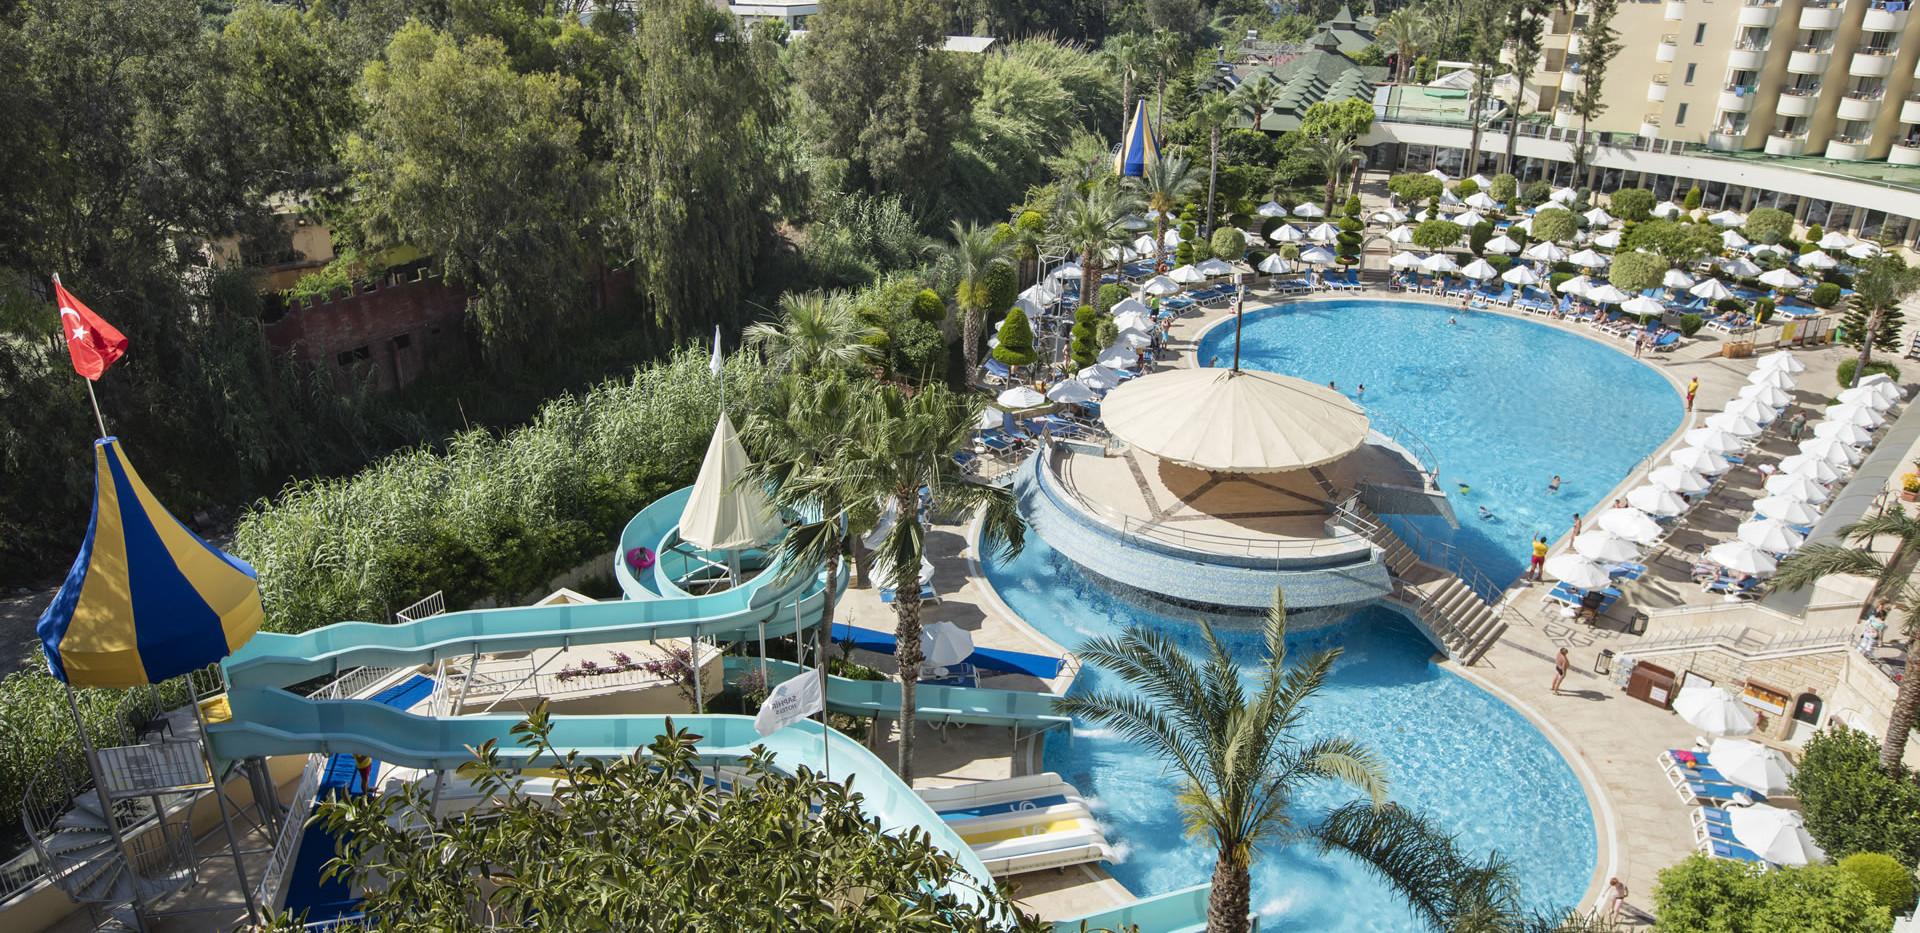 saphir-hotel-villas-otelimiz-309.jpg